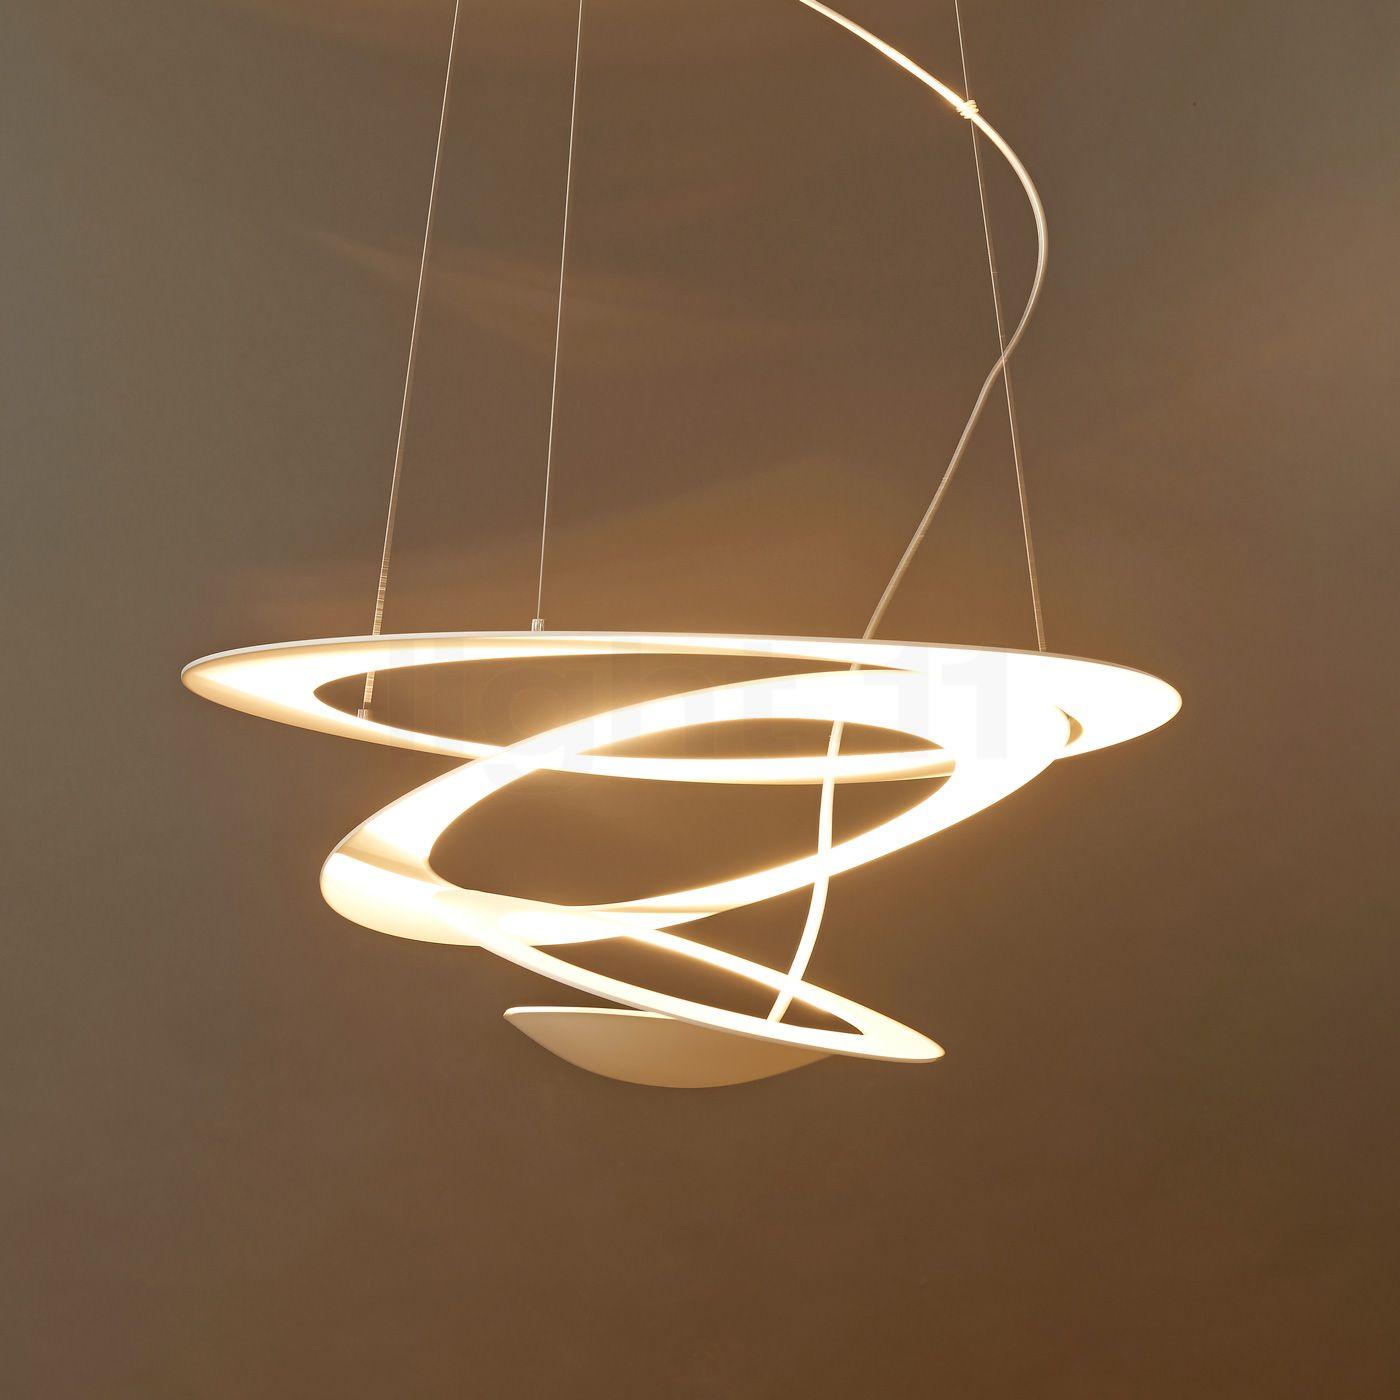 Artemide pirce micro sospensione led pendant lights arubaitofo Gallery